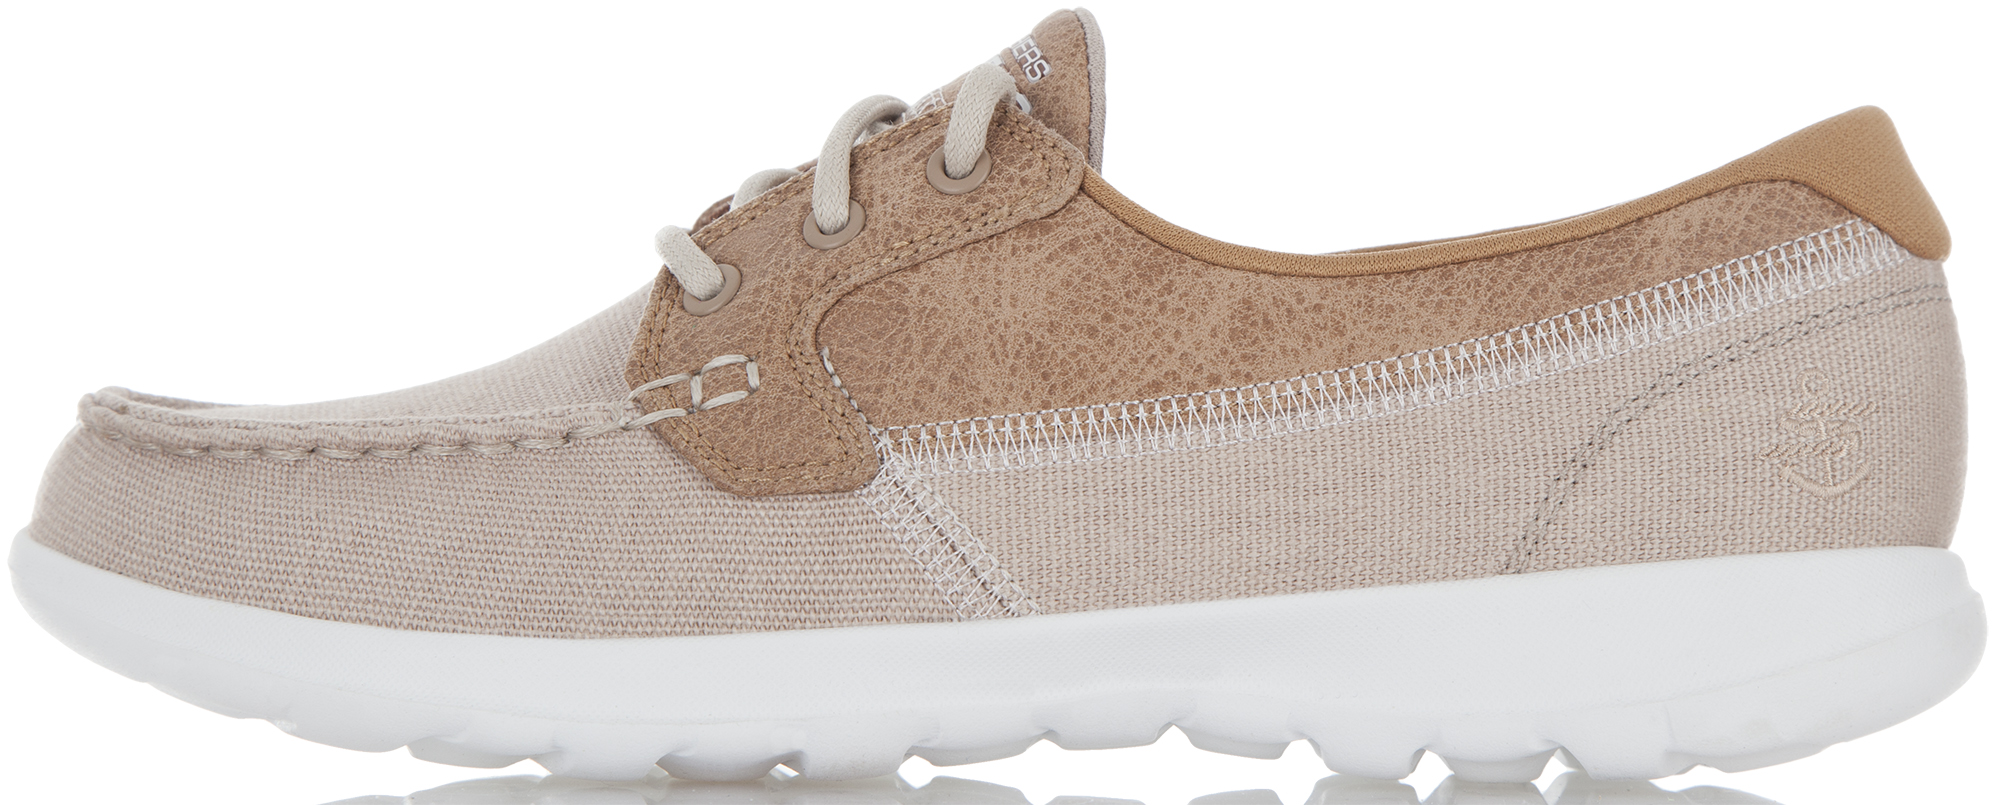 Skechers Полуботинки женские Skechers Go Walk Lite-Coral, размер 41